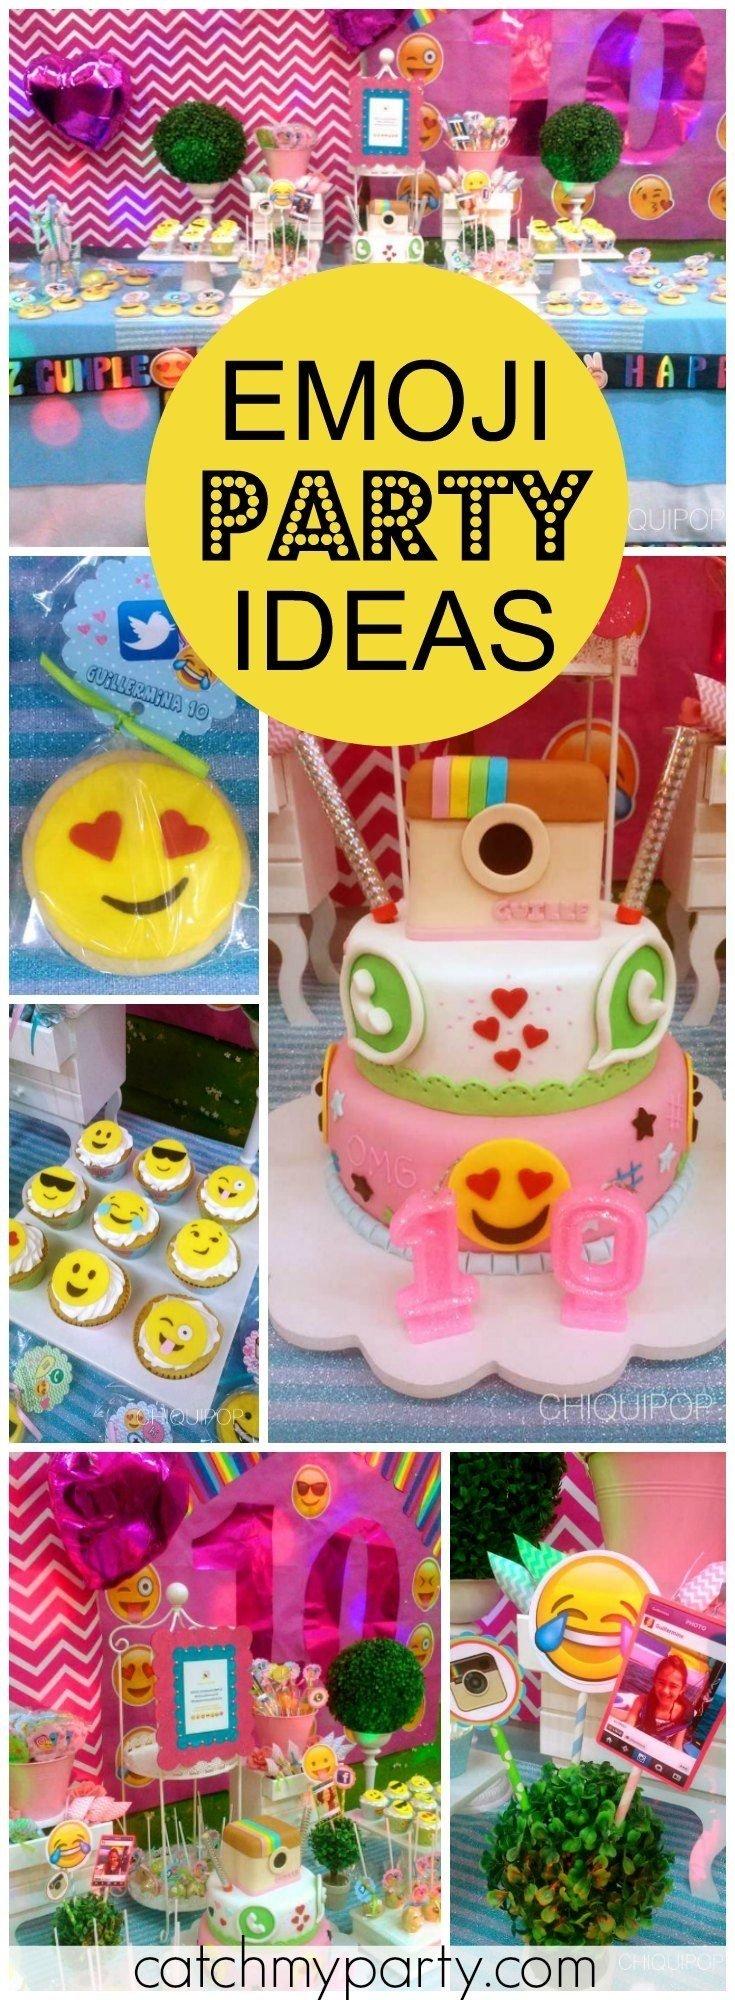 10 Best Fun Birthday Ideas For 13 Year Olds 12 best thirteenth birthday images on pinterest birthdays party 3 2021